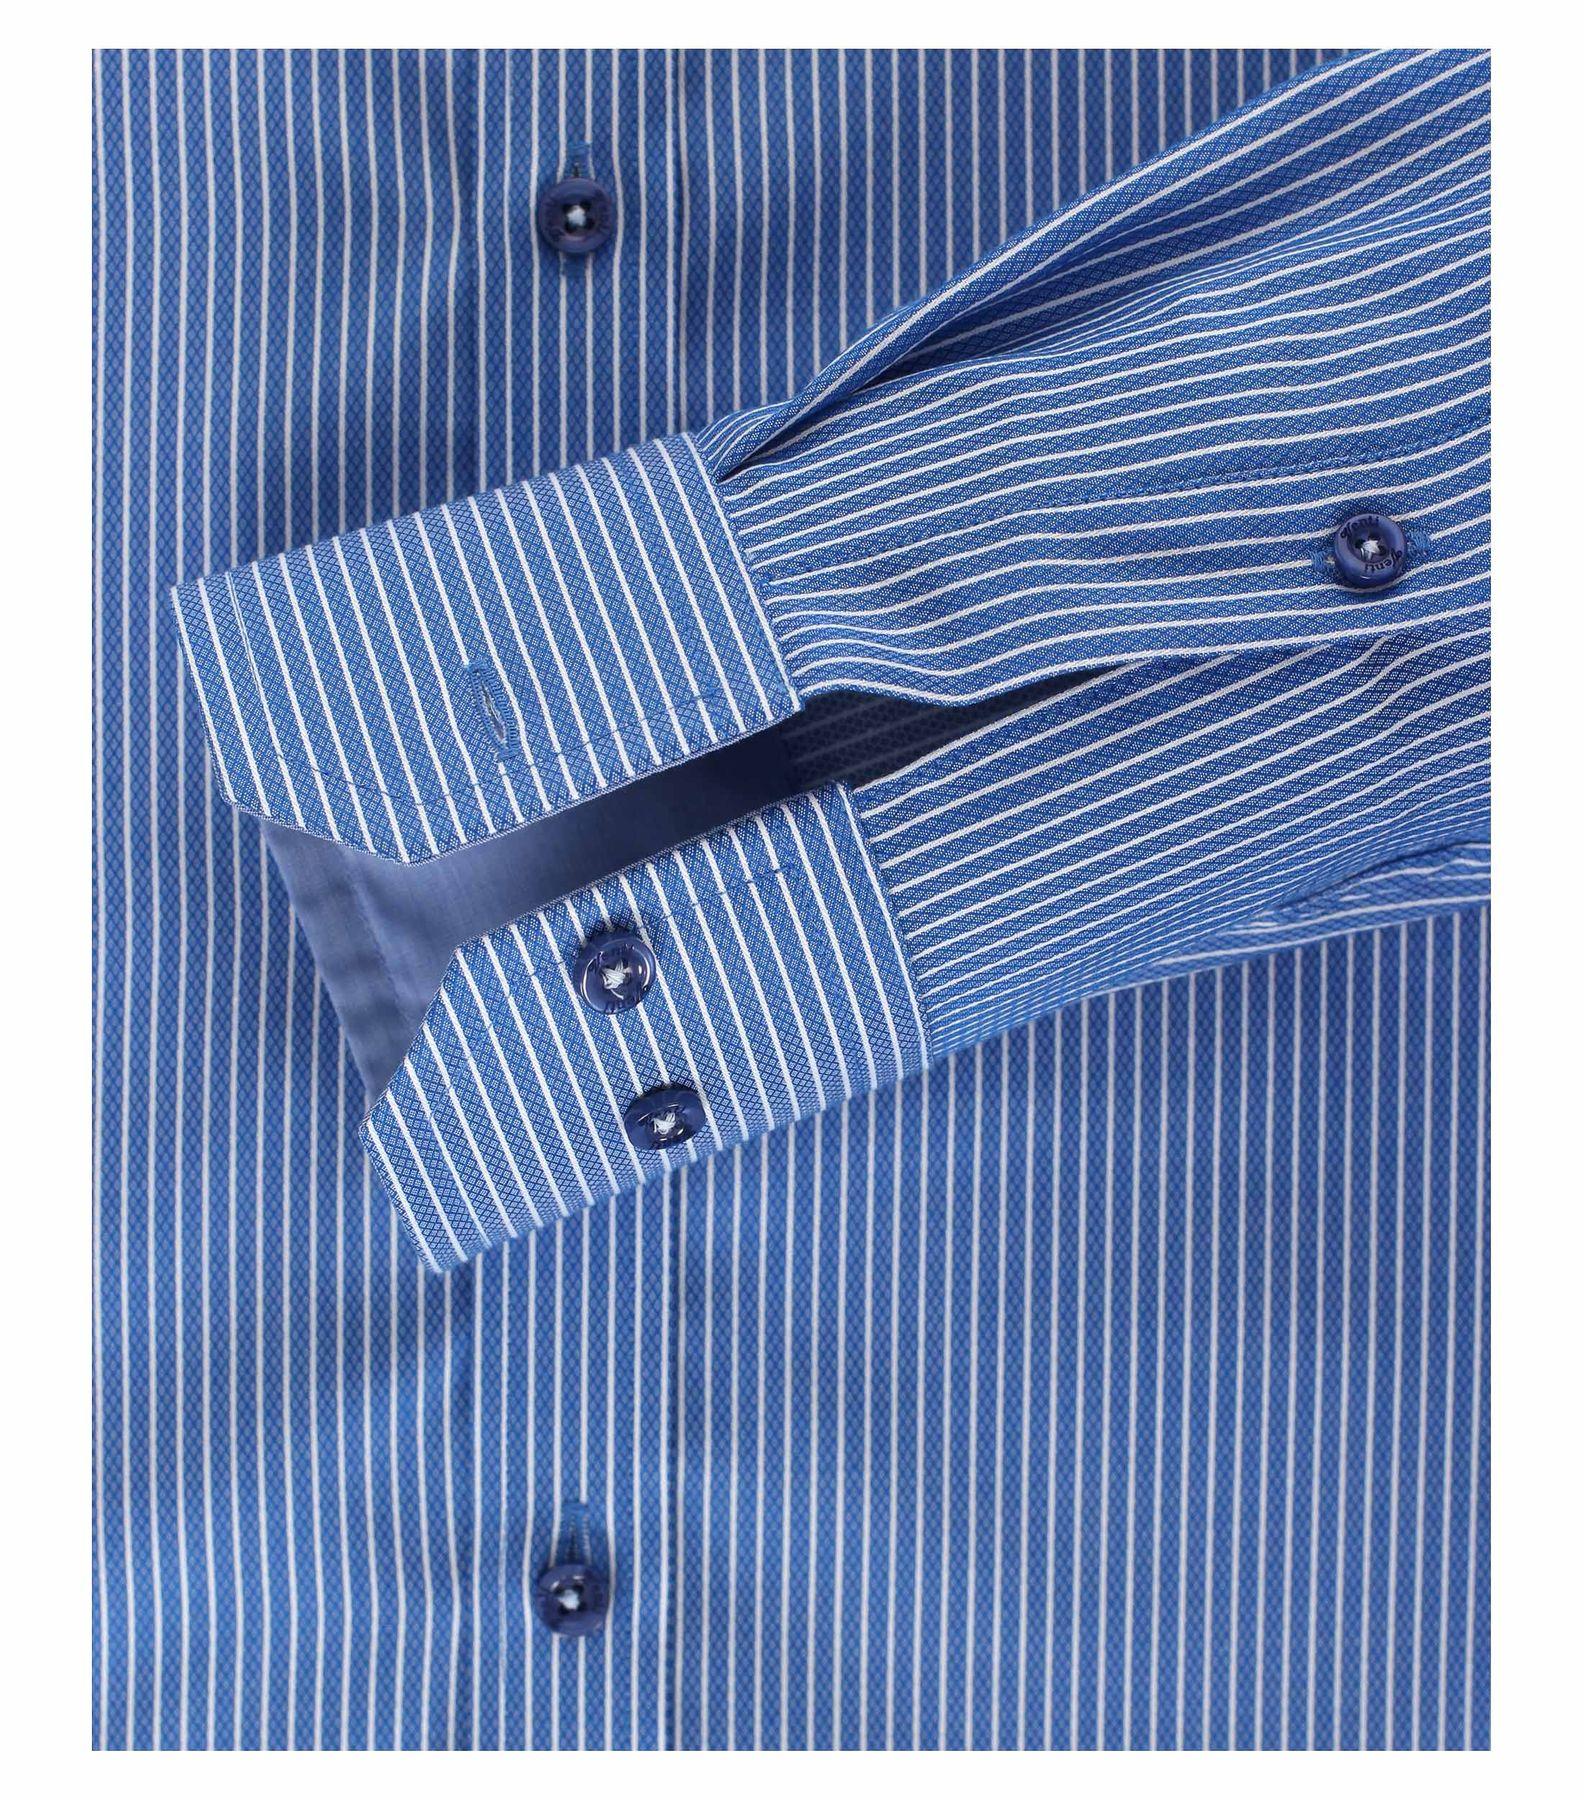 Venti - Slim Fit - Herren Langarm Hemd gestreift mit Kent Kragen (172678700) – Bild 8